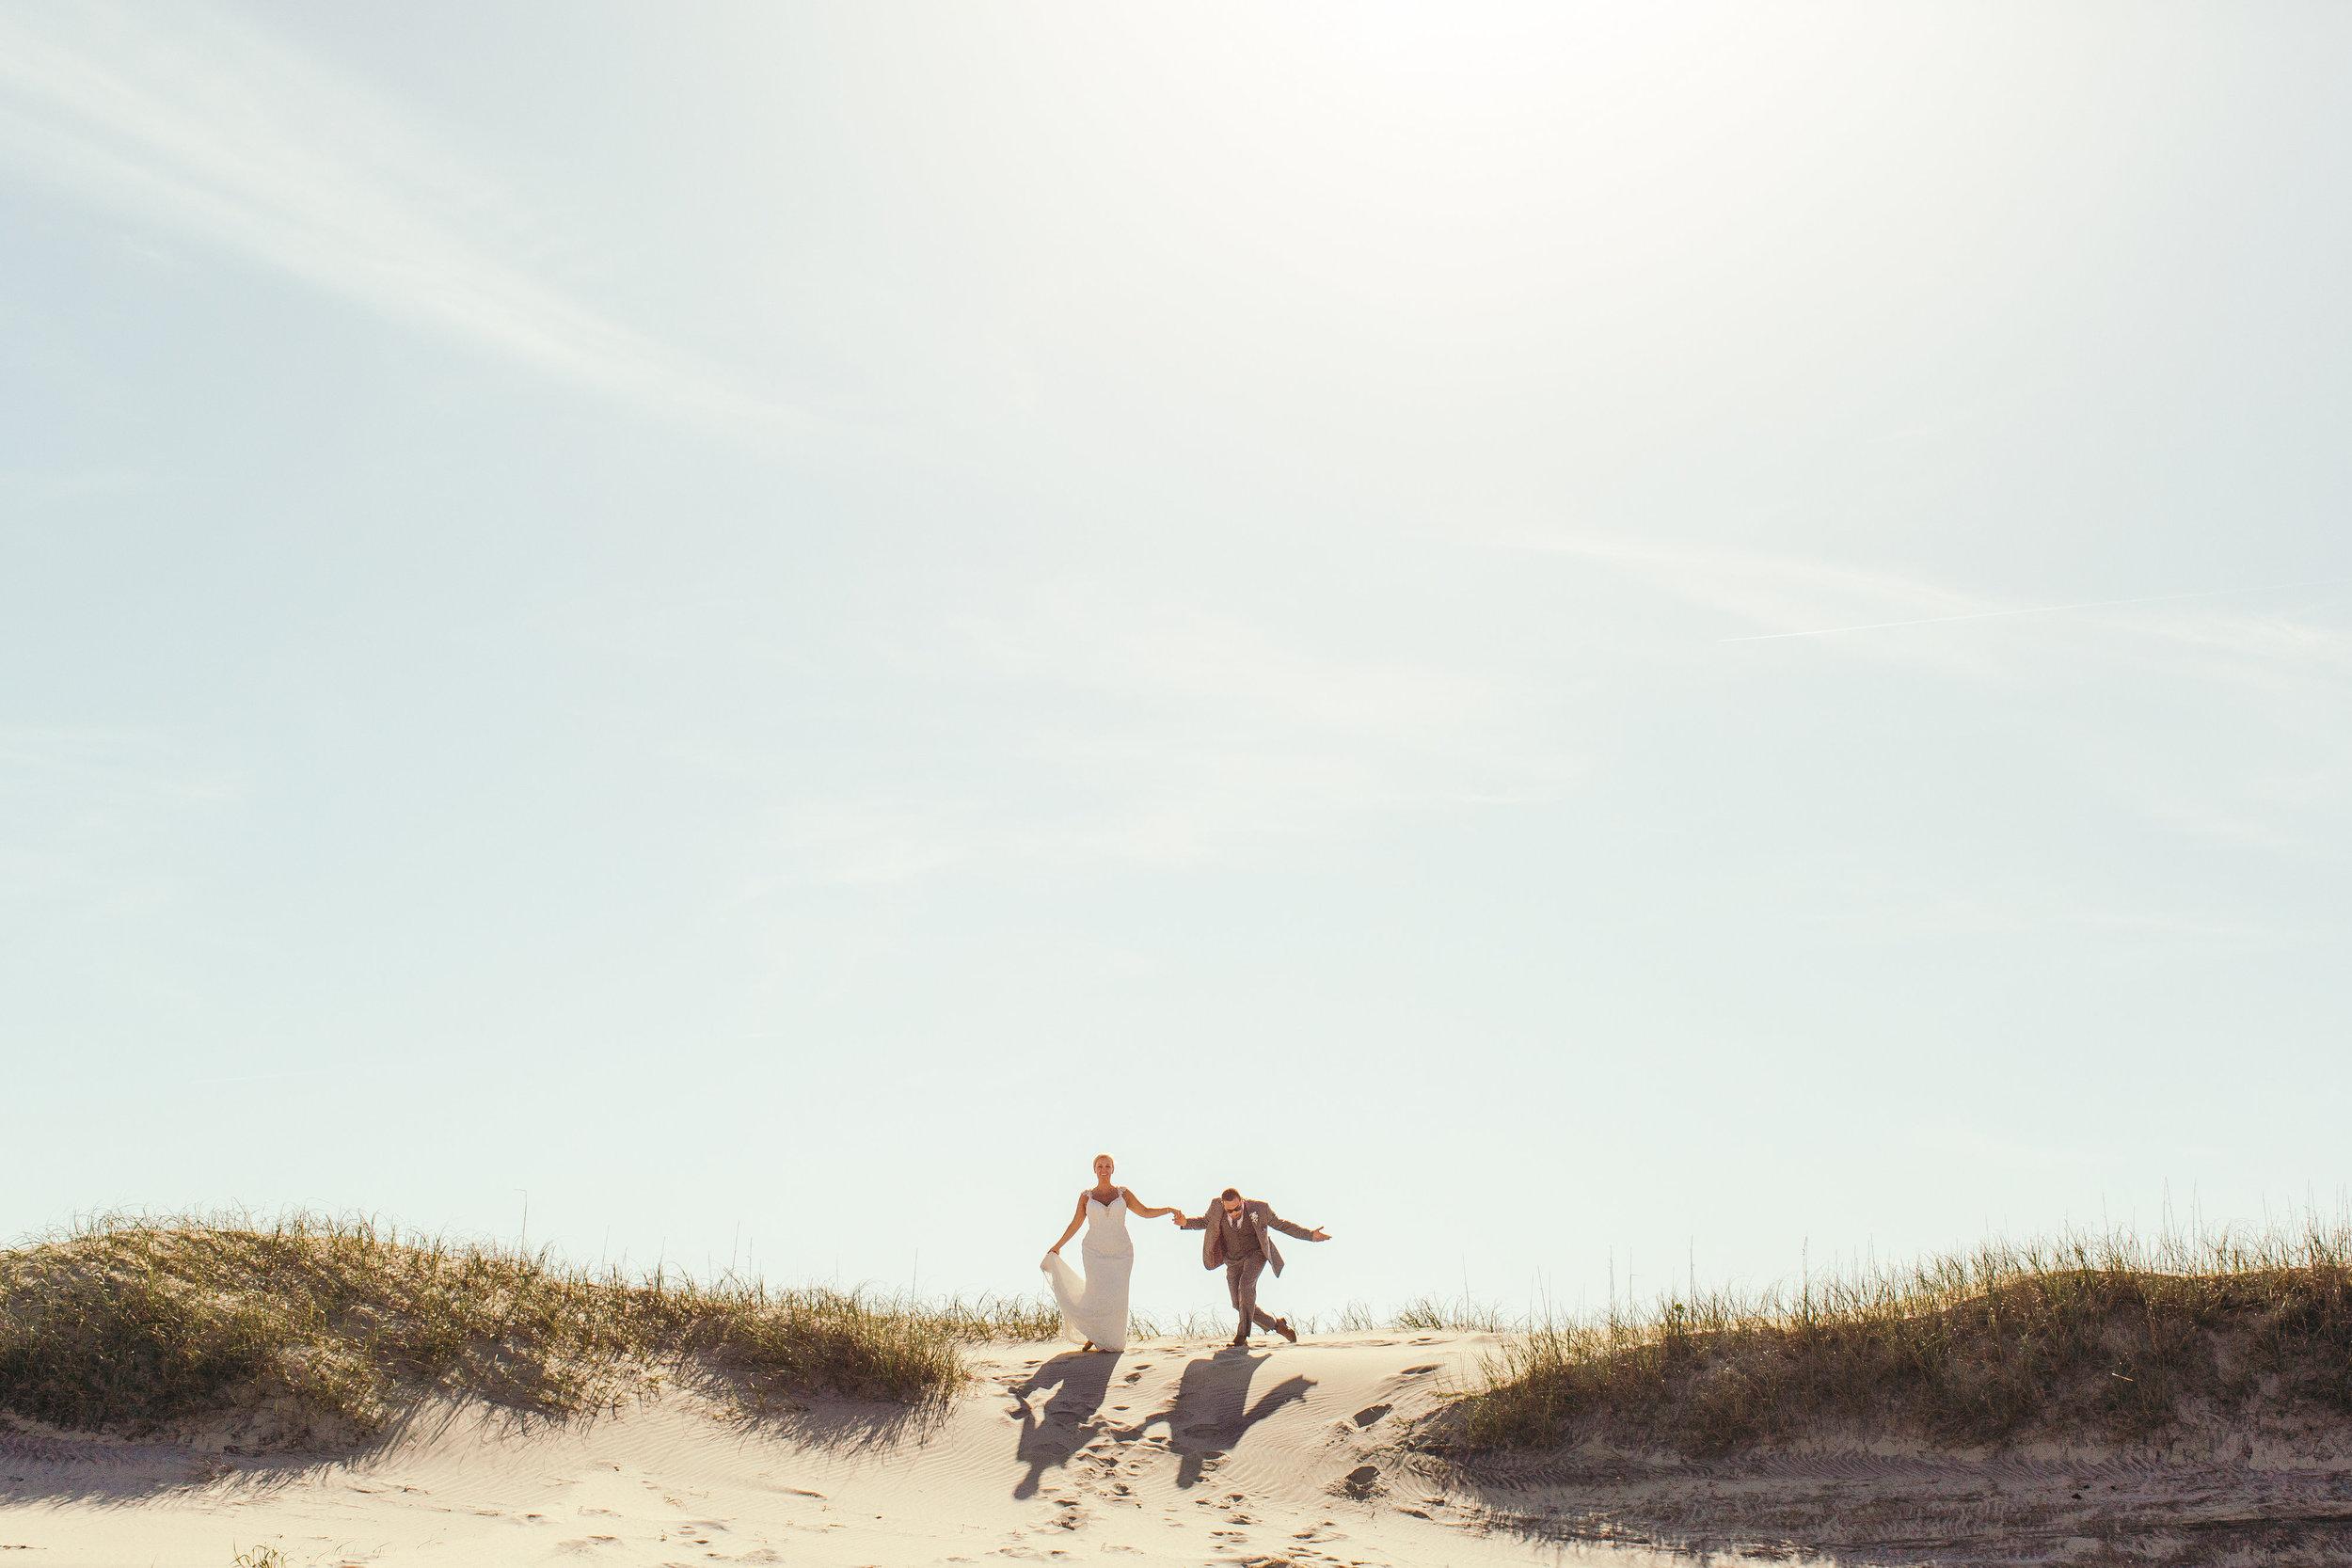 Betty Clicker Wedding Photography couple running on sand dunes